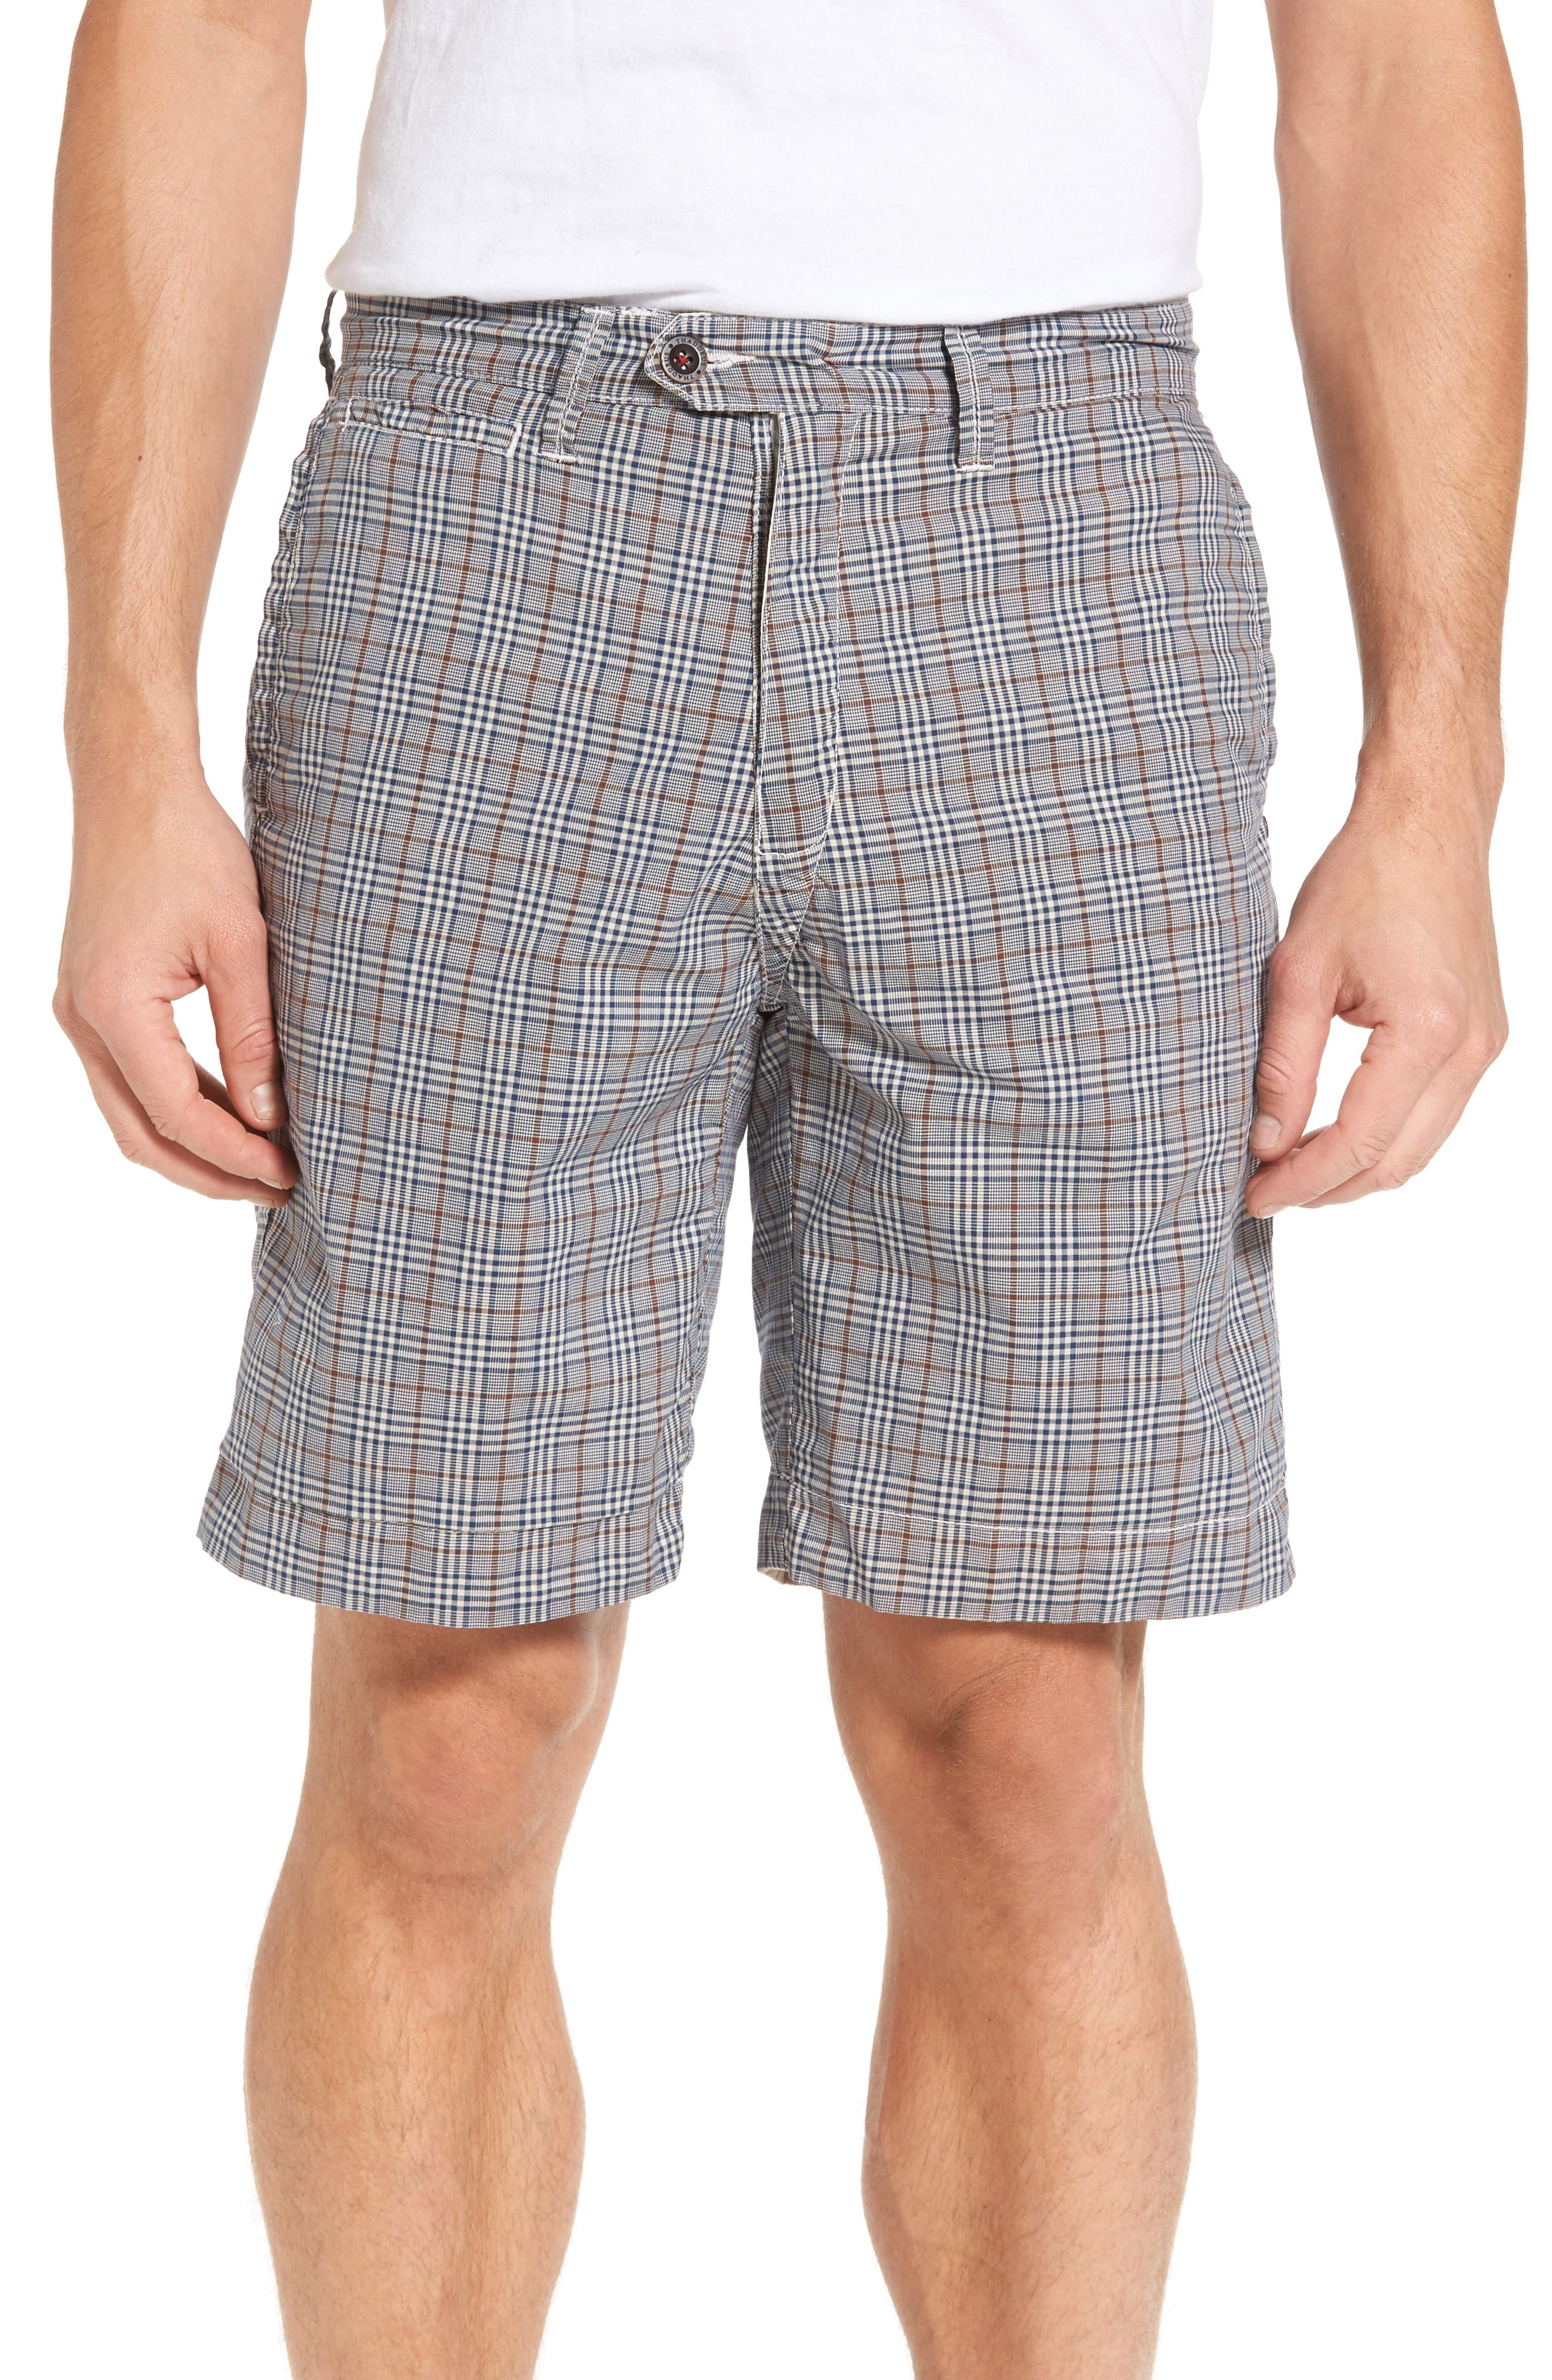 Darlington Reversible Flat Front Shorts,                             Alternate thumbnail 4, color,                             290